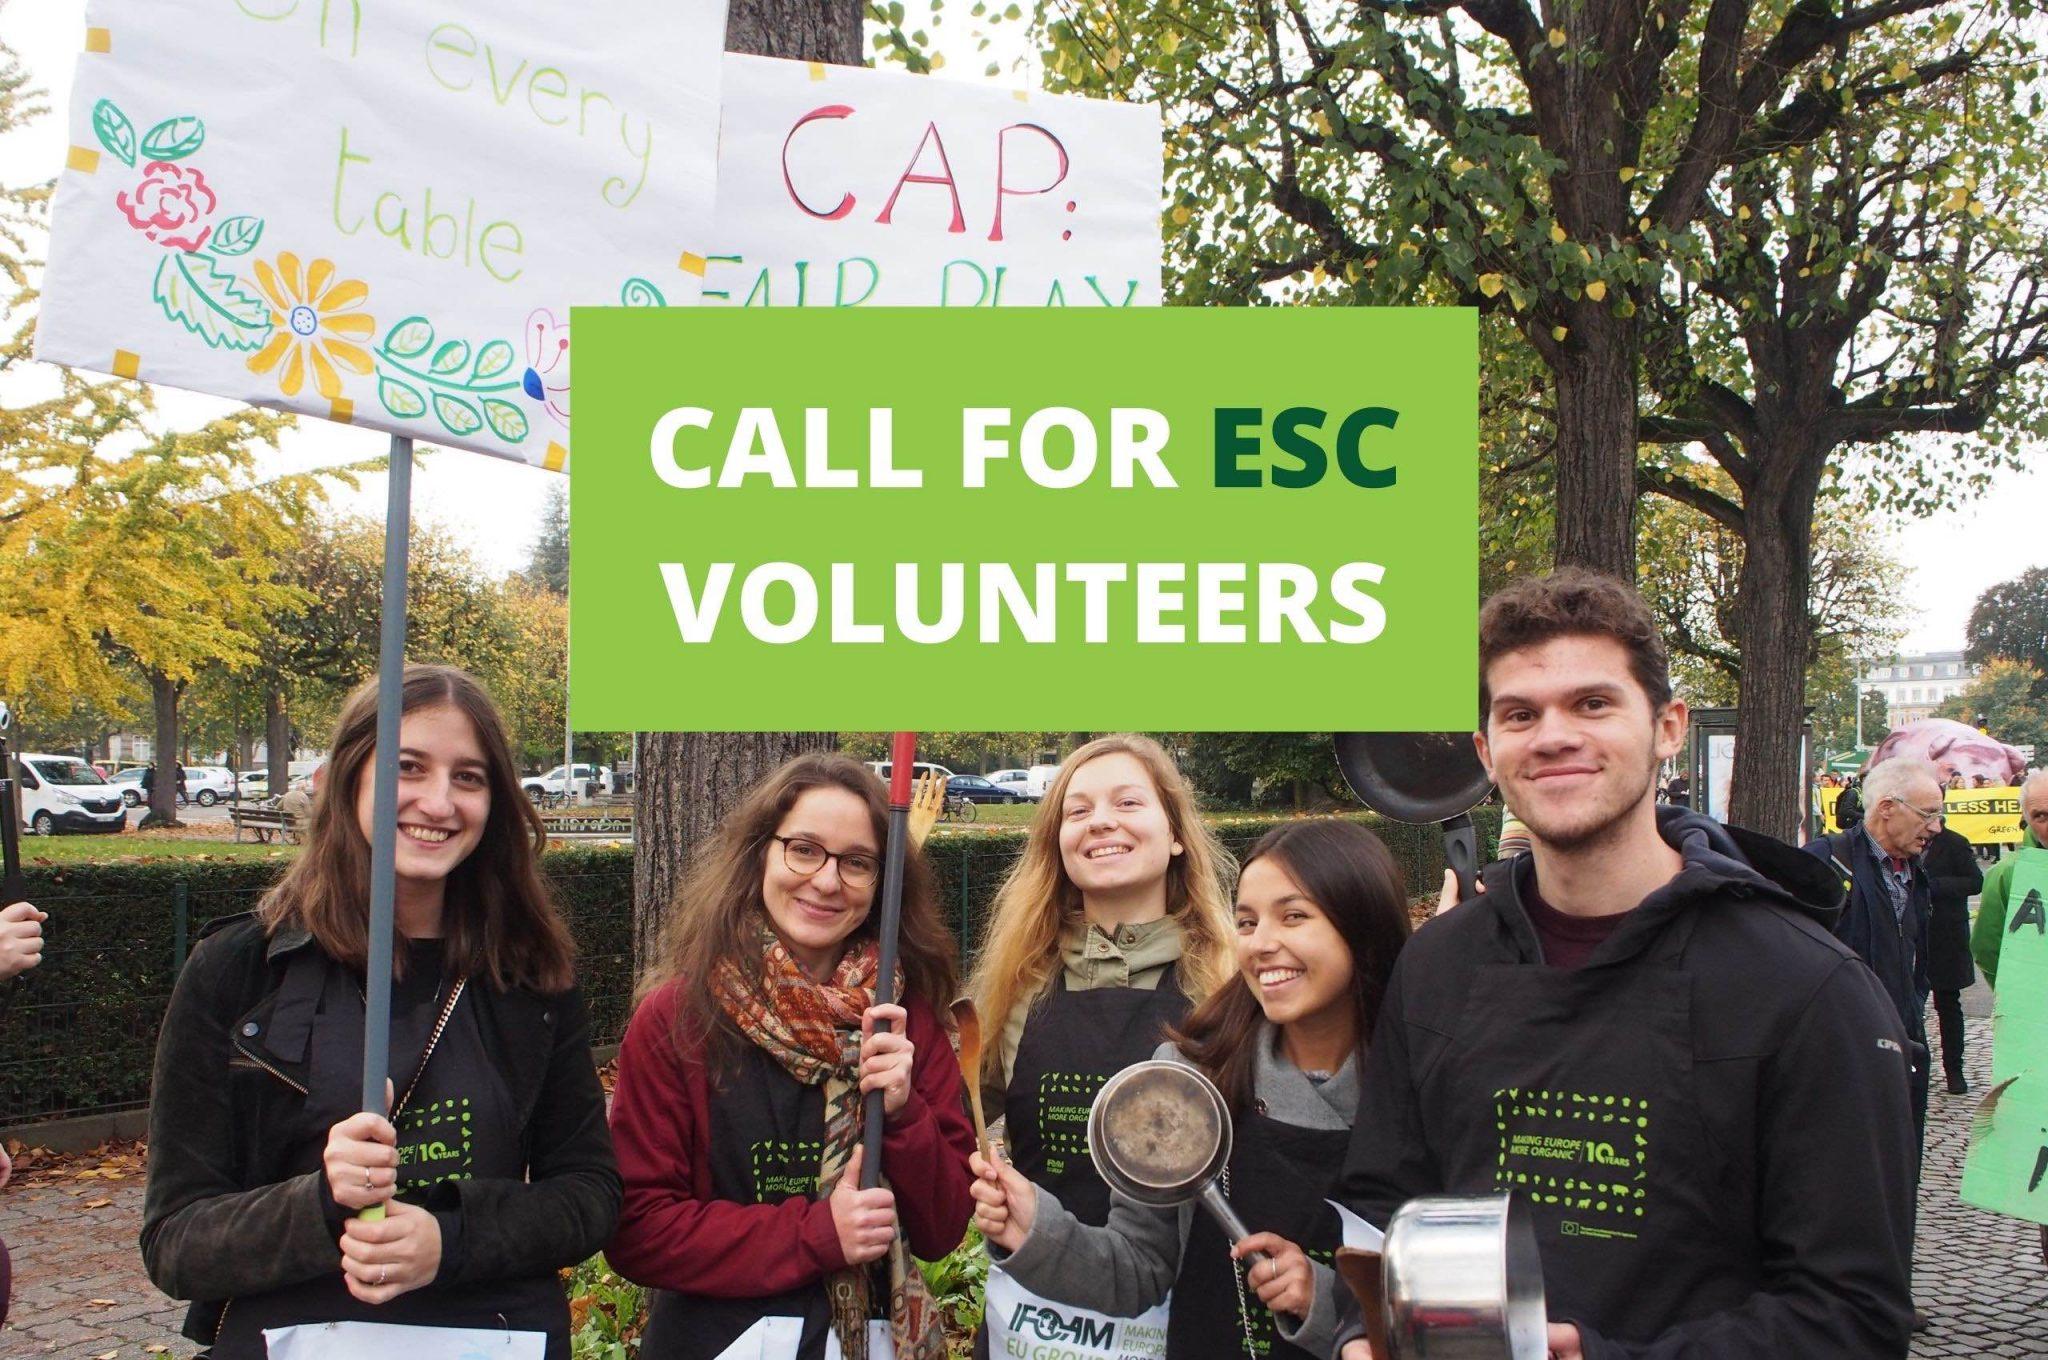 ifoam organics europe home page esc volunteers vacancies